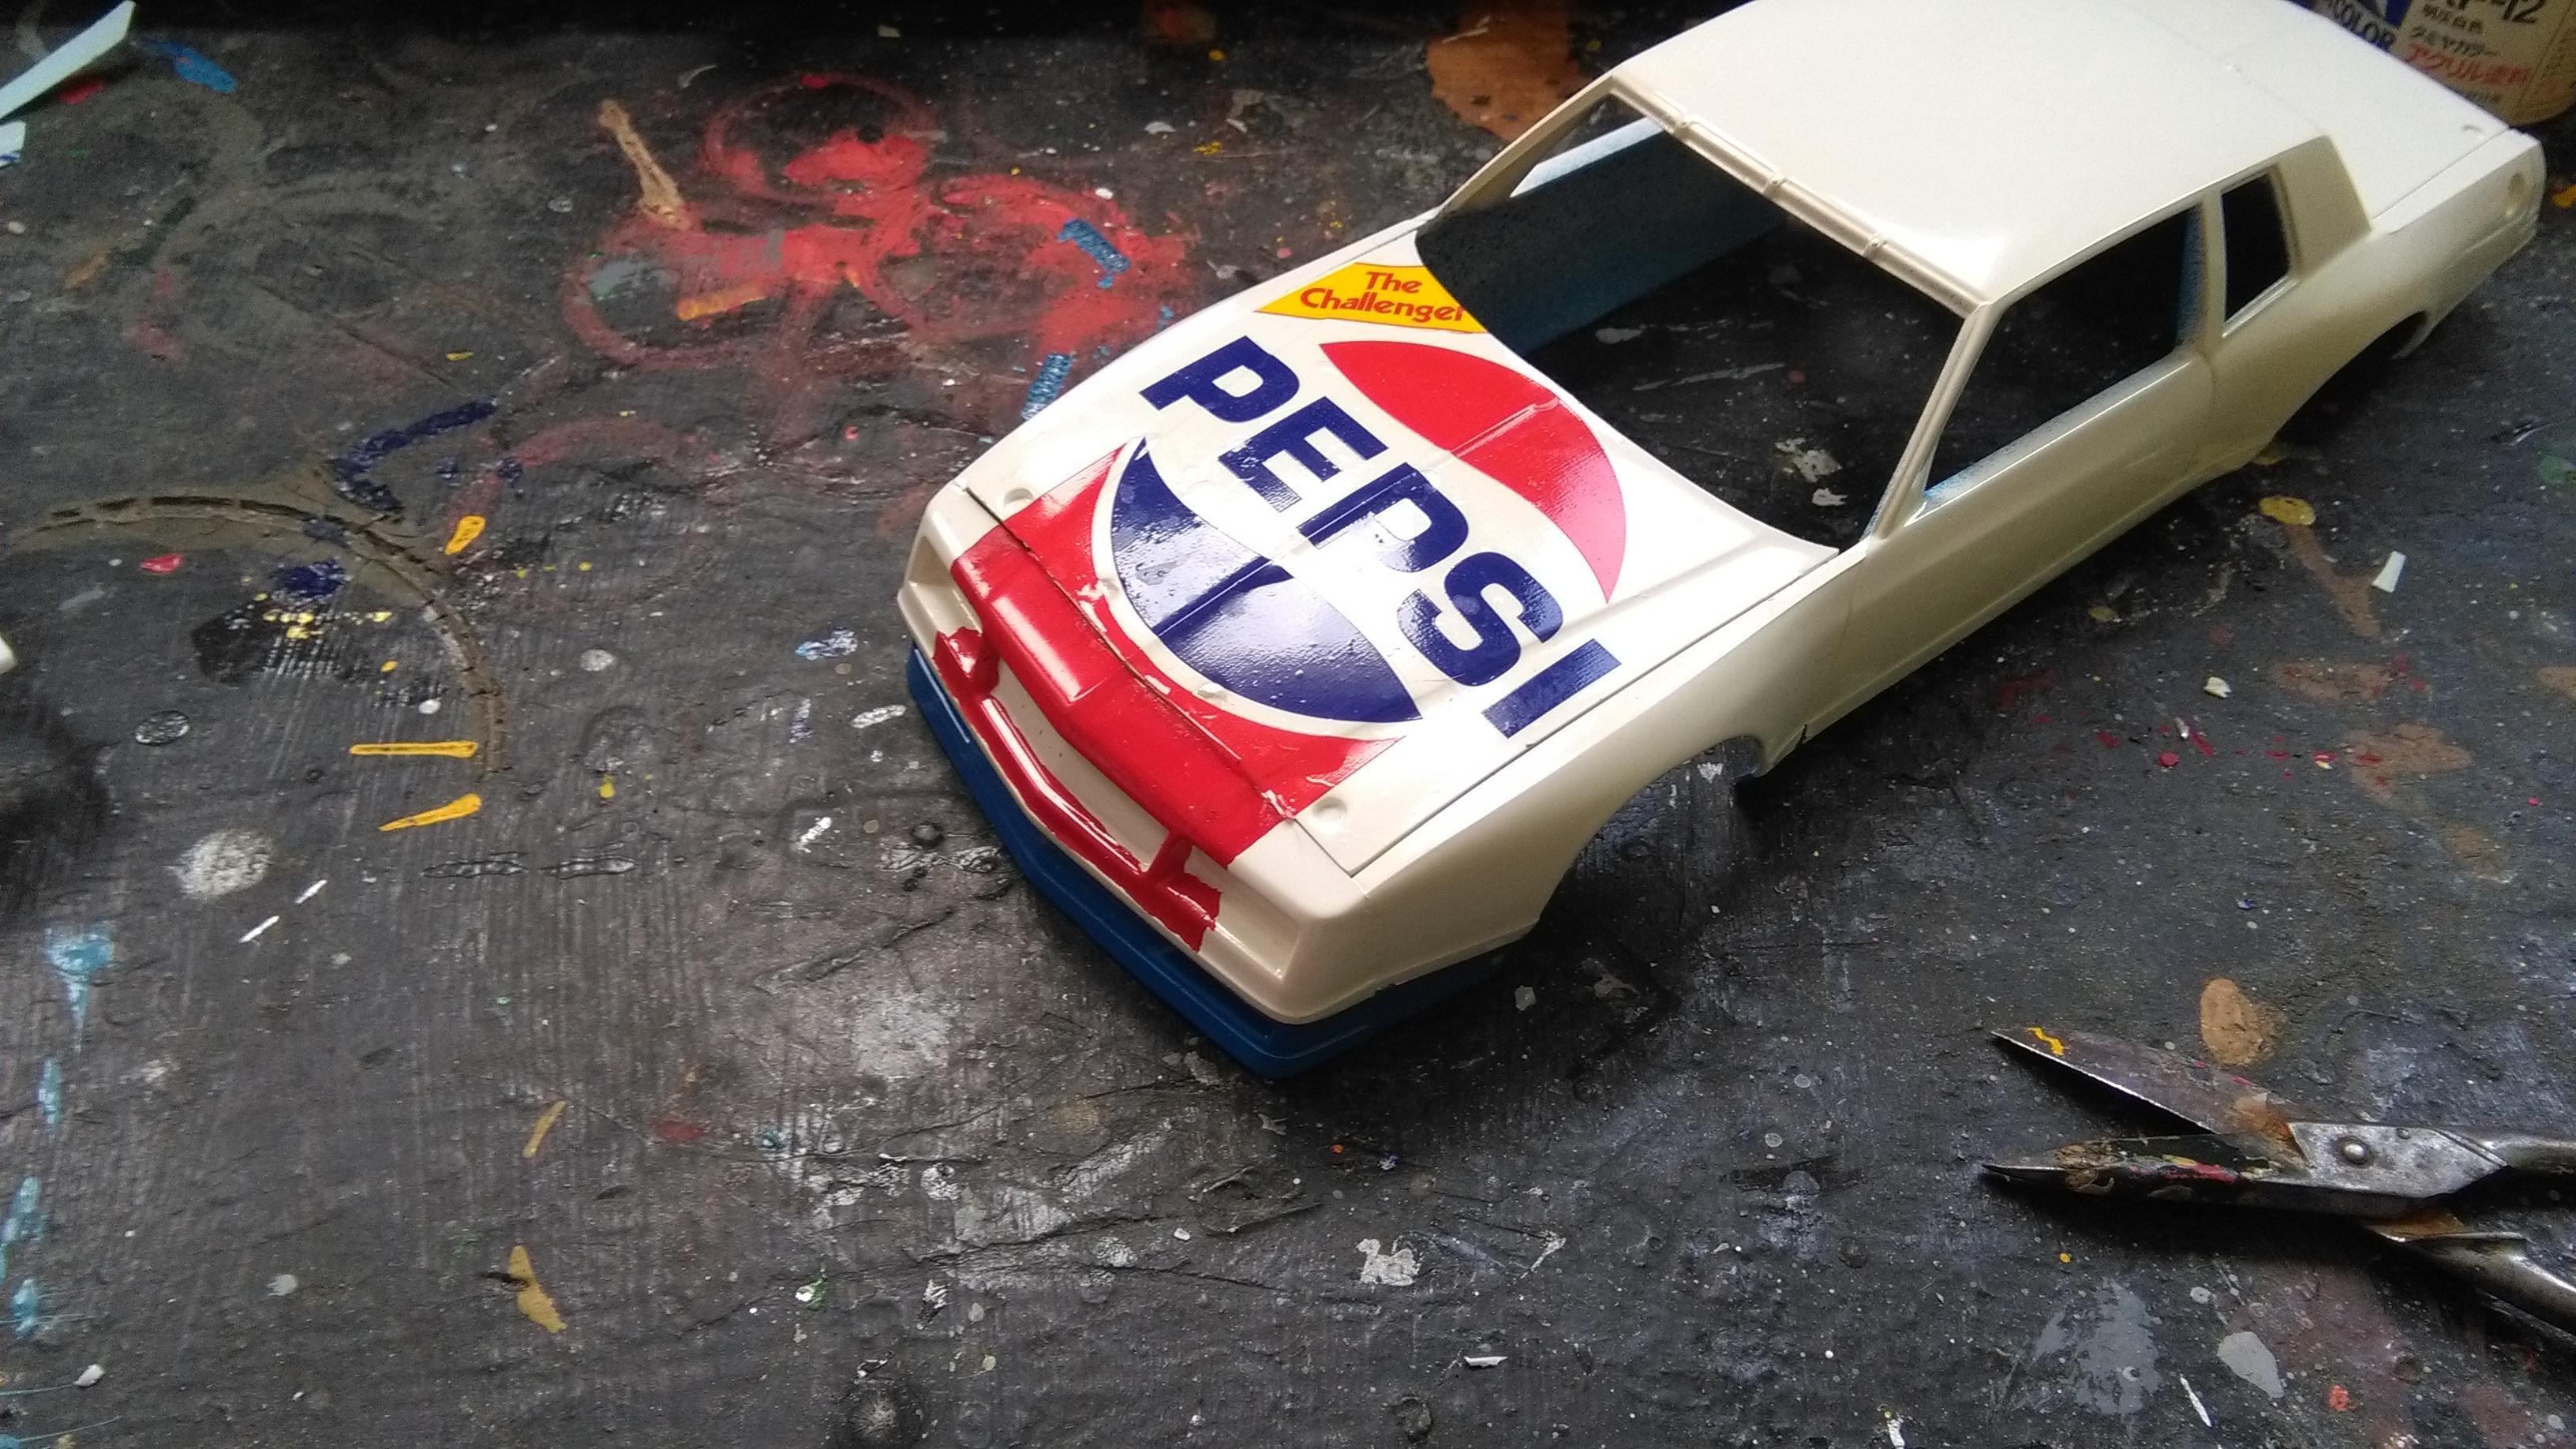 Chevy Monte-Carlo 1983 #11 Darrell Waltrip Pepsi  984435IMG20170429133241